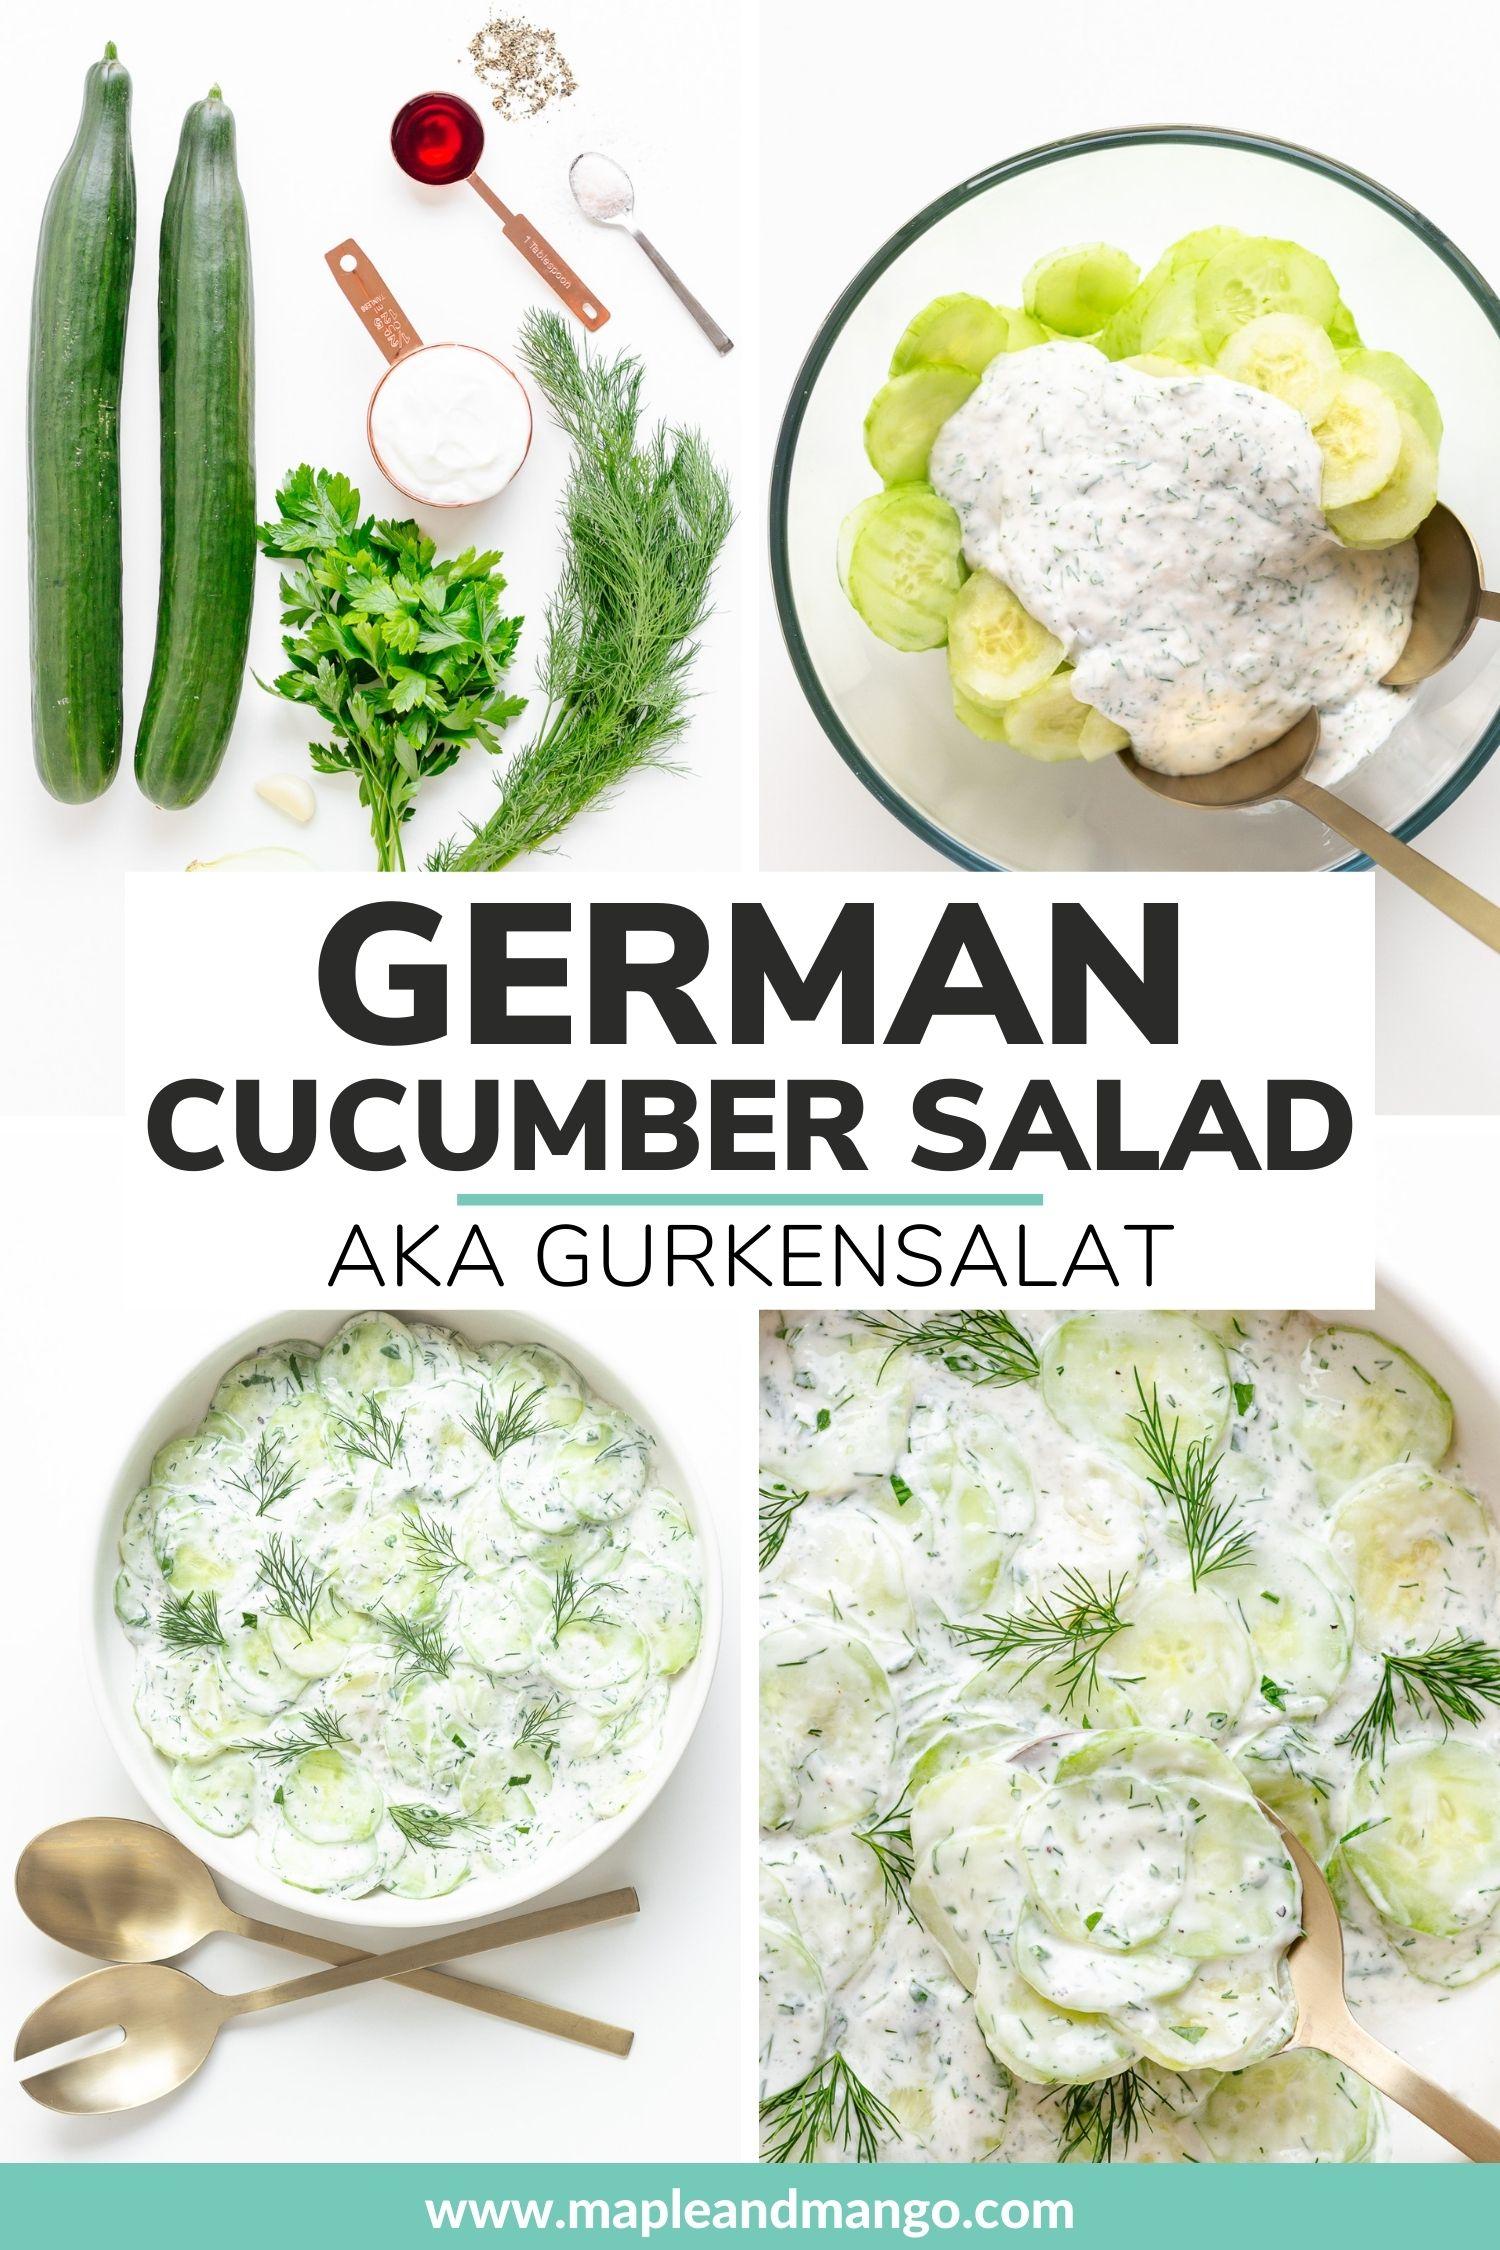 Pinterest collage for German Cucumber Salad (aka Gurkensalat).